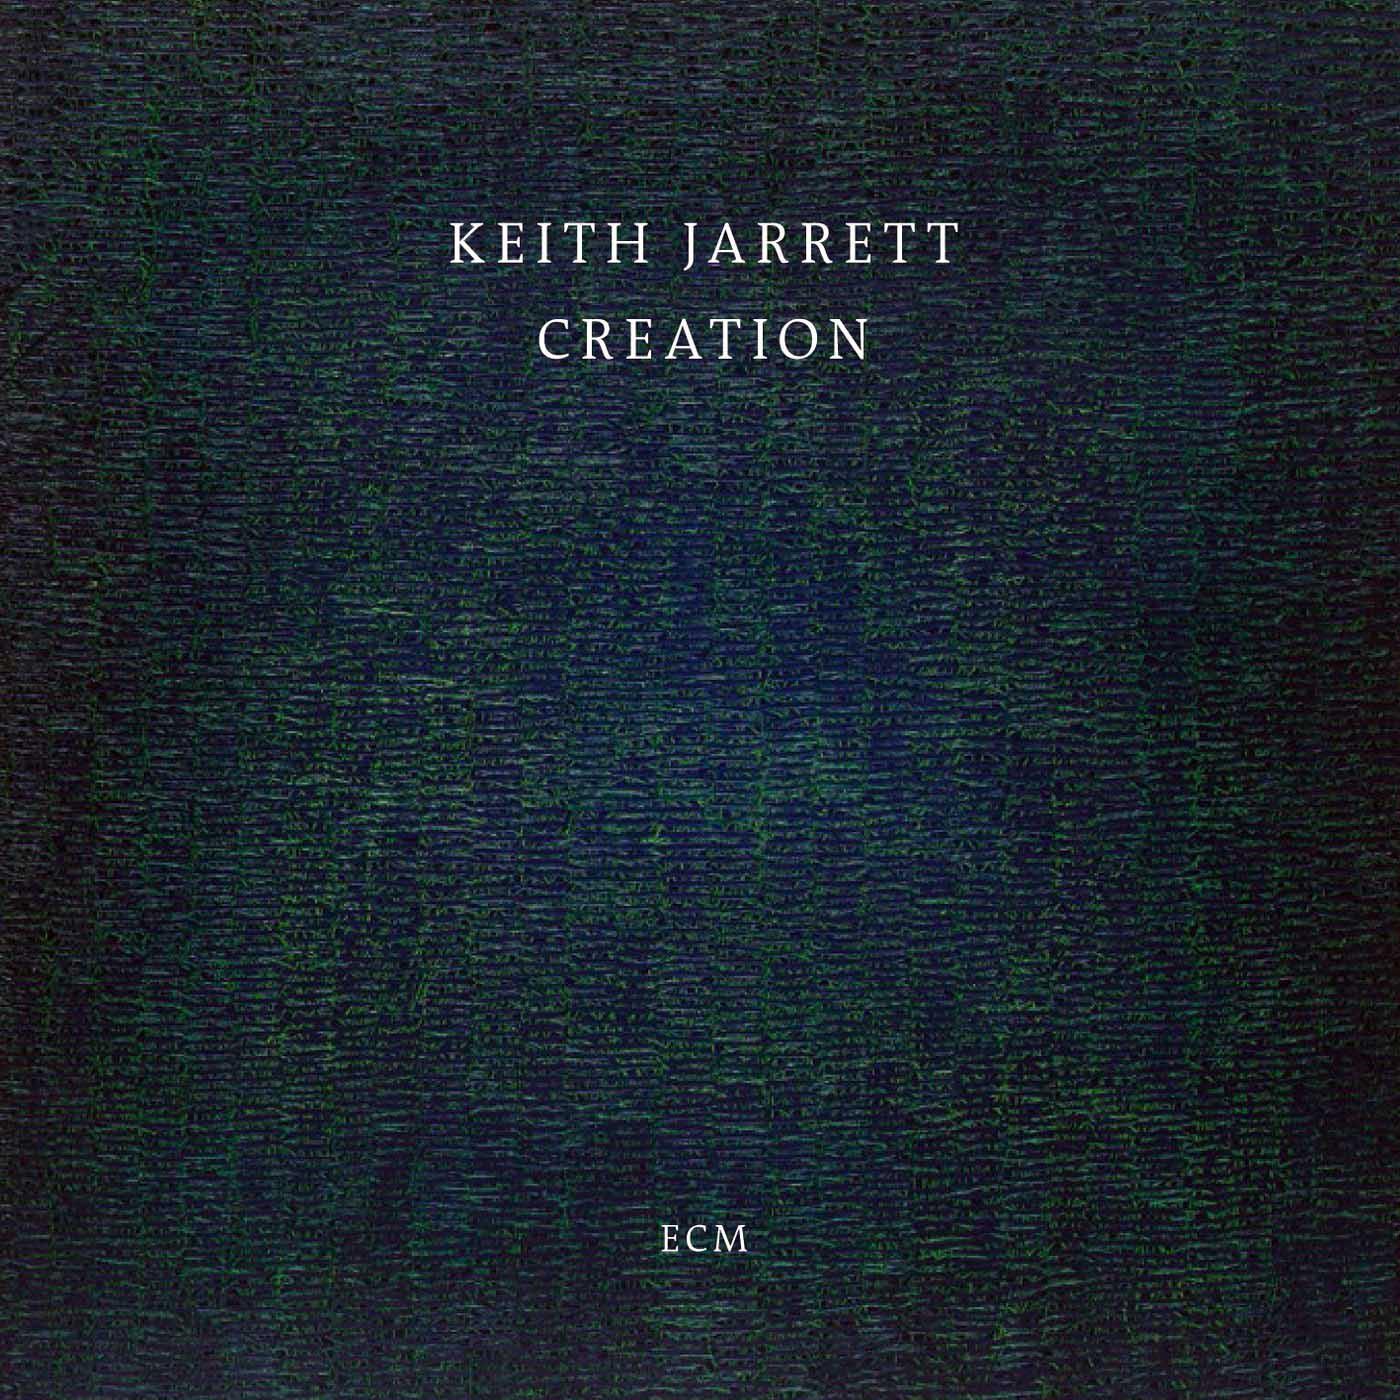 creatrion keith jarrett